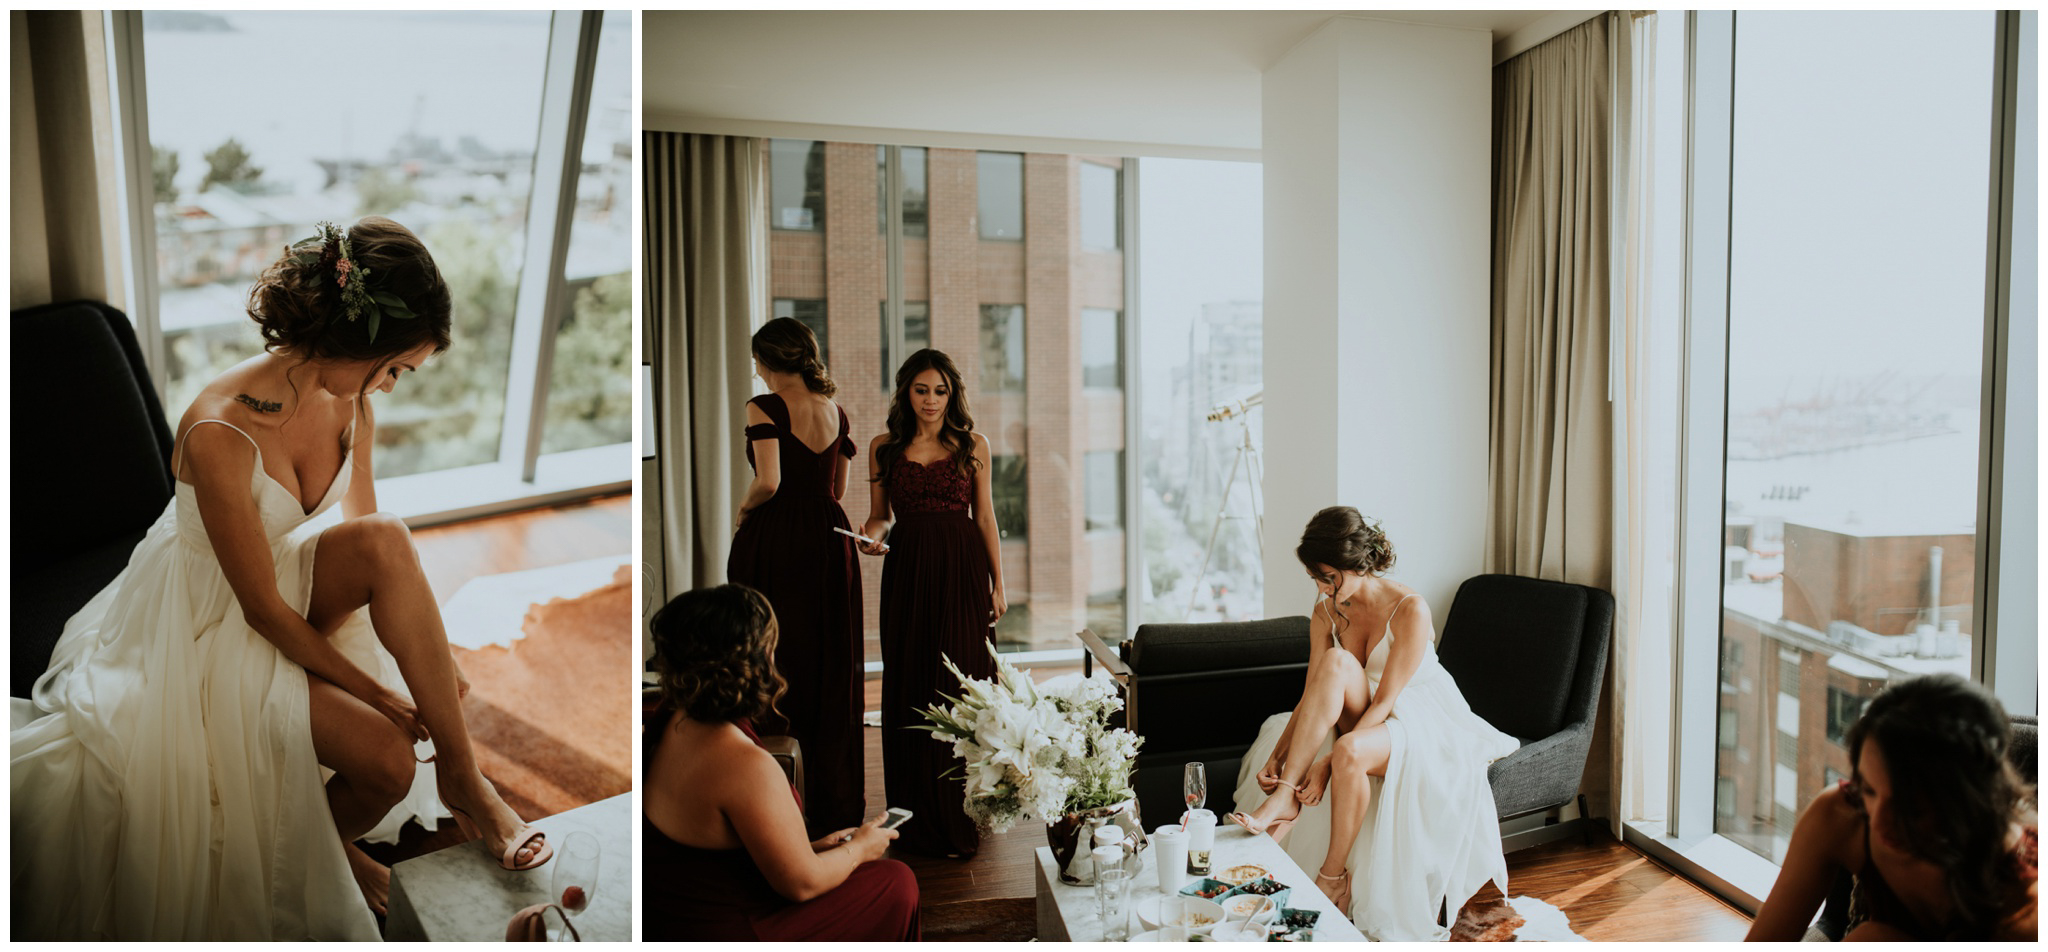 alyssa-keiran-westland-distillery-urban-seattle-wedding-photographer-caitlyn-nikula-42.jpg